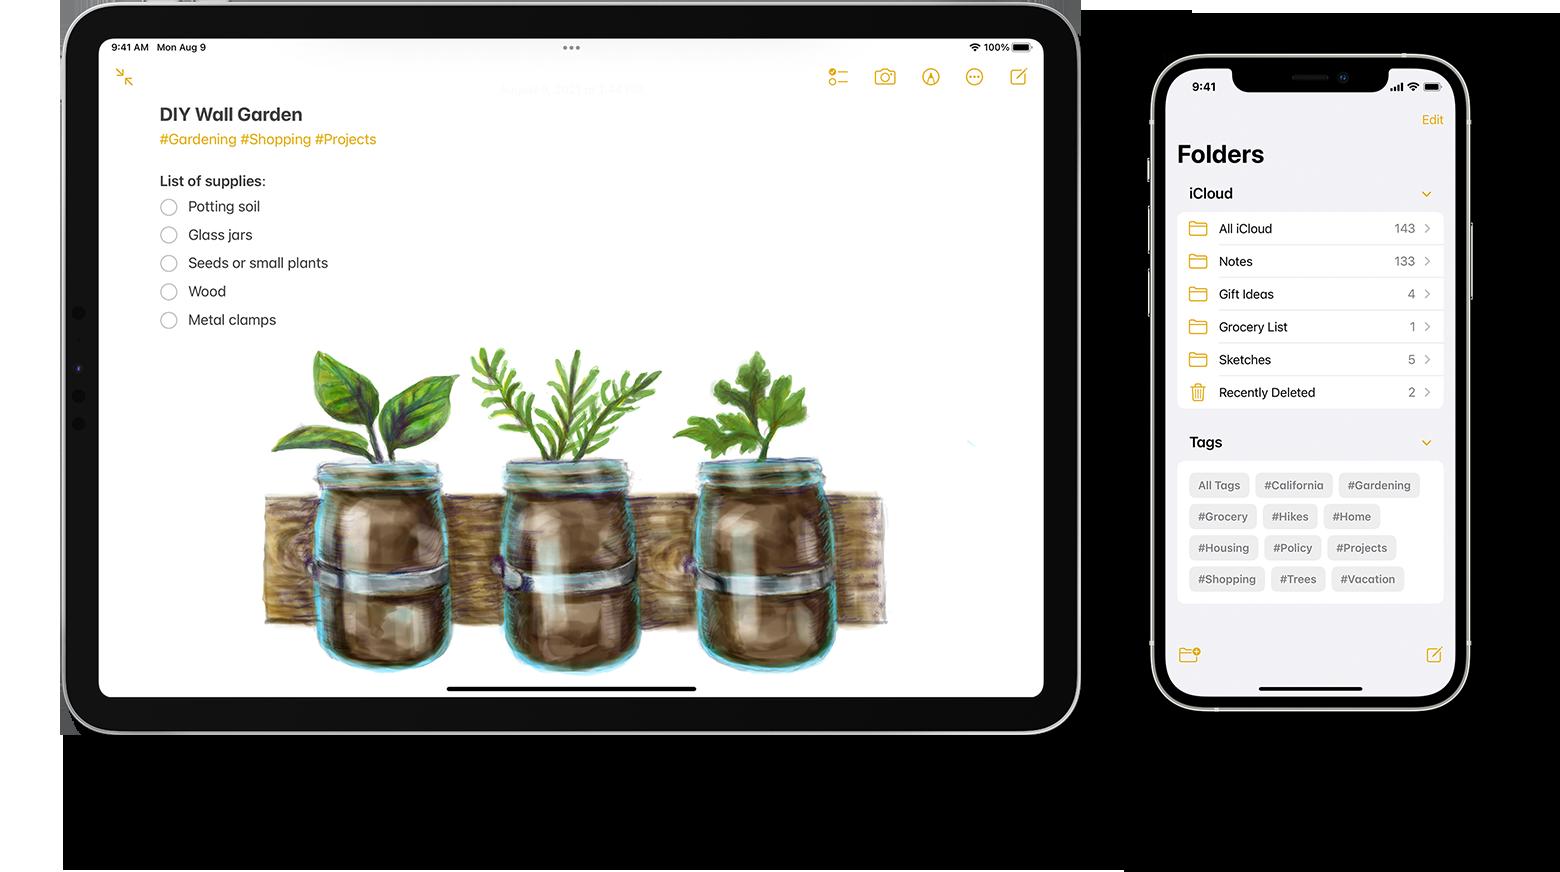 iPad και iPhone που εμφανίζουν μια λίστα με ετικέτες